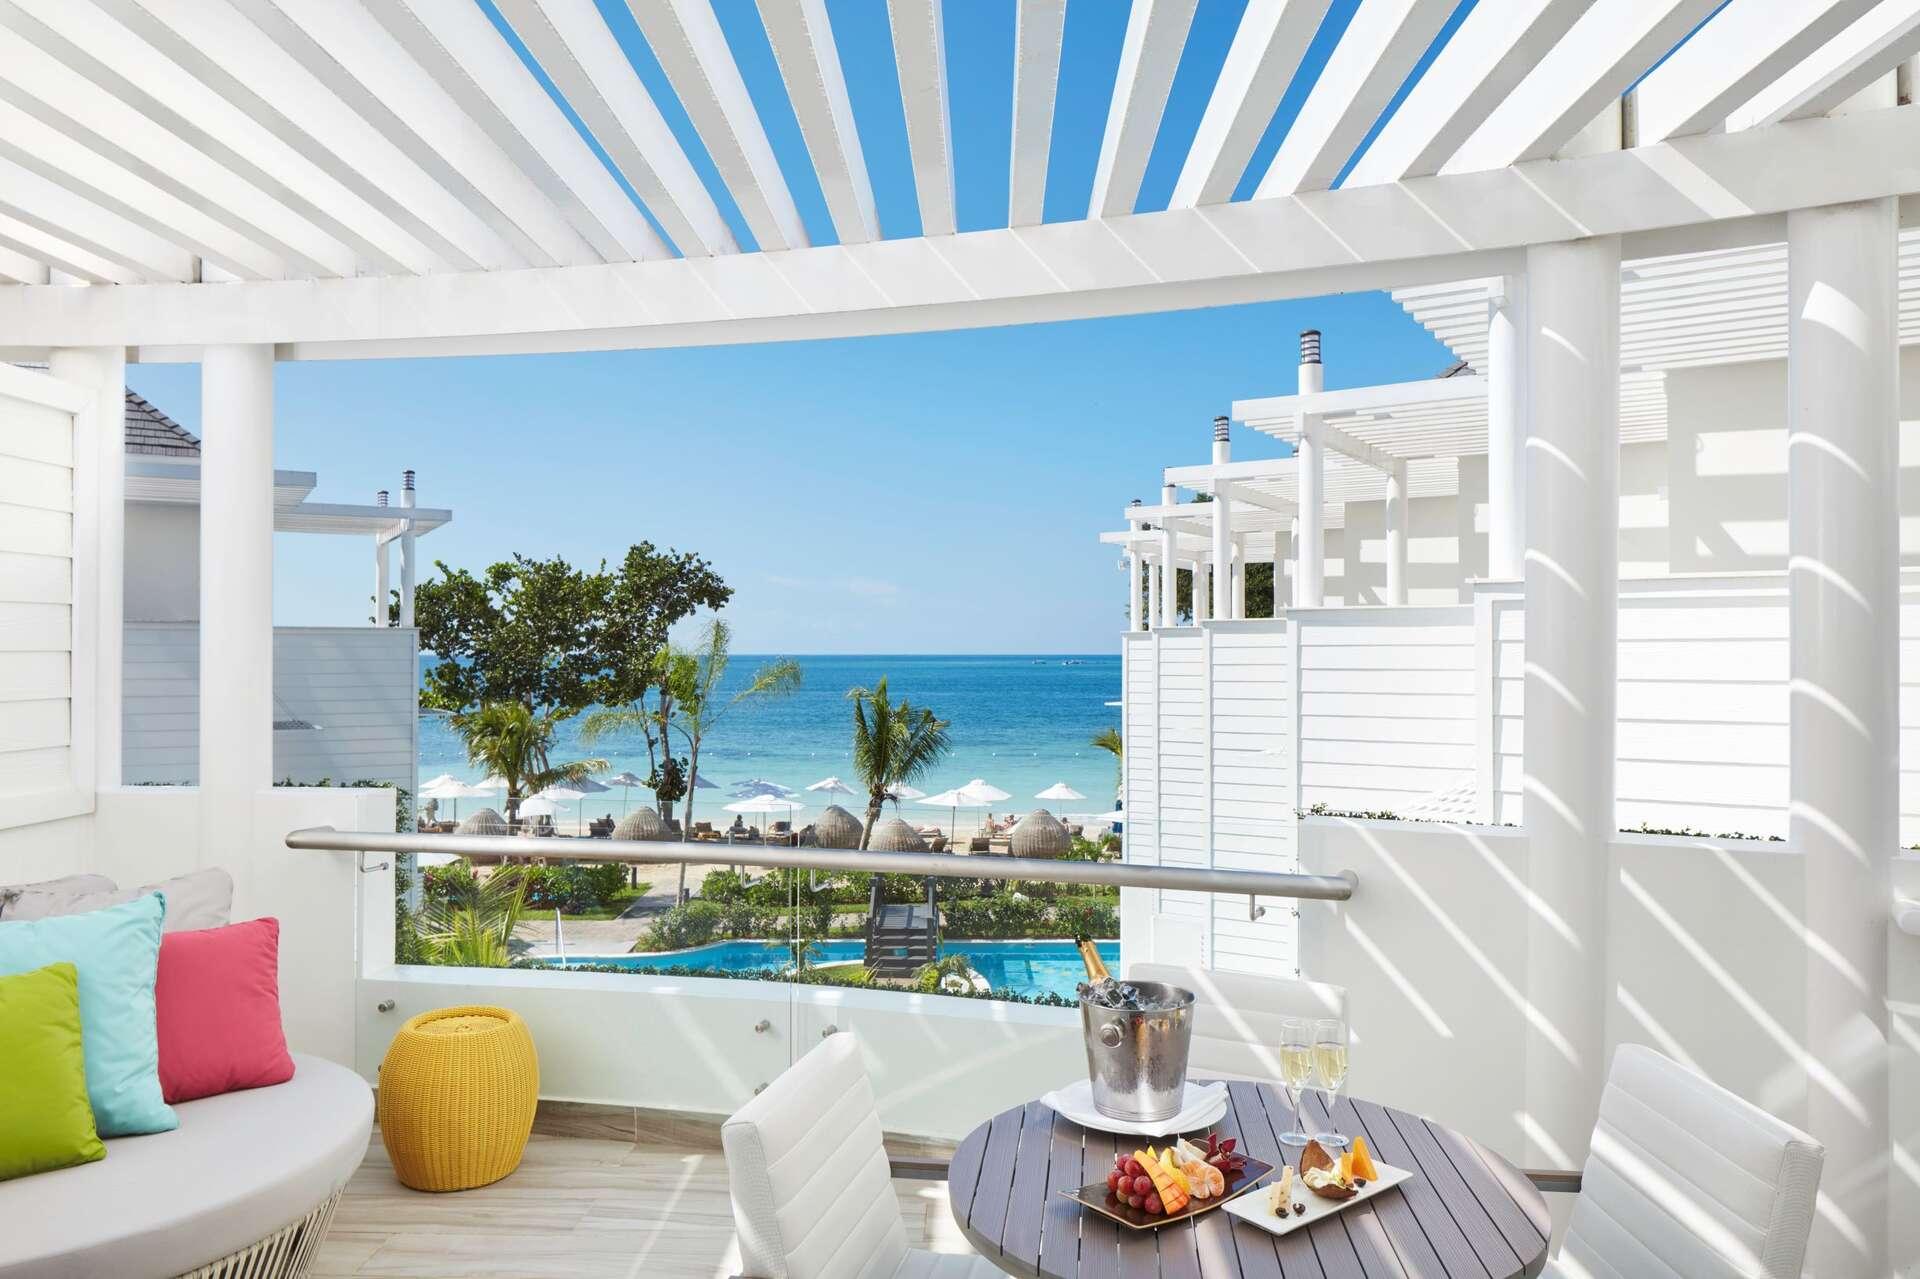 Luxury villa rentals caribbean - Jamaica - Negril - Azul beach resort negril - One Bedroom Presidential Suite - Image 1/14